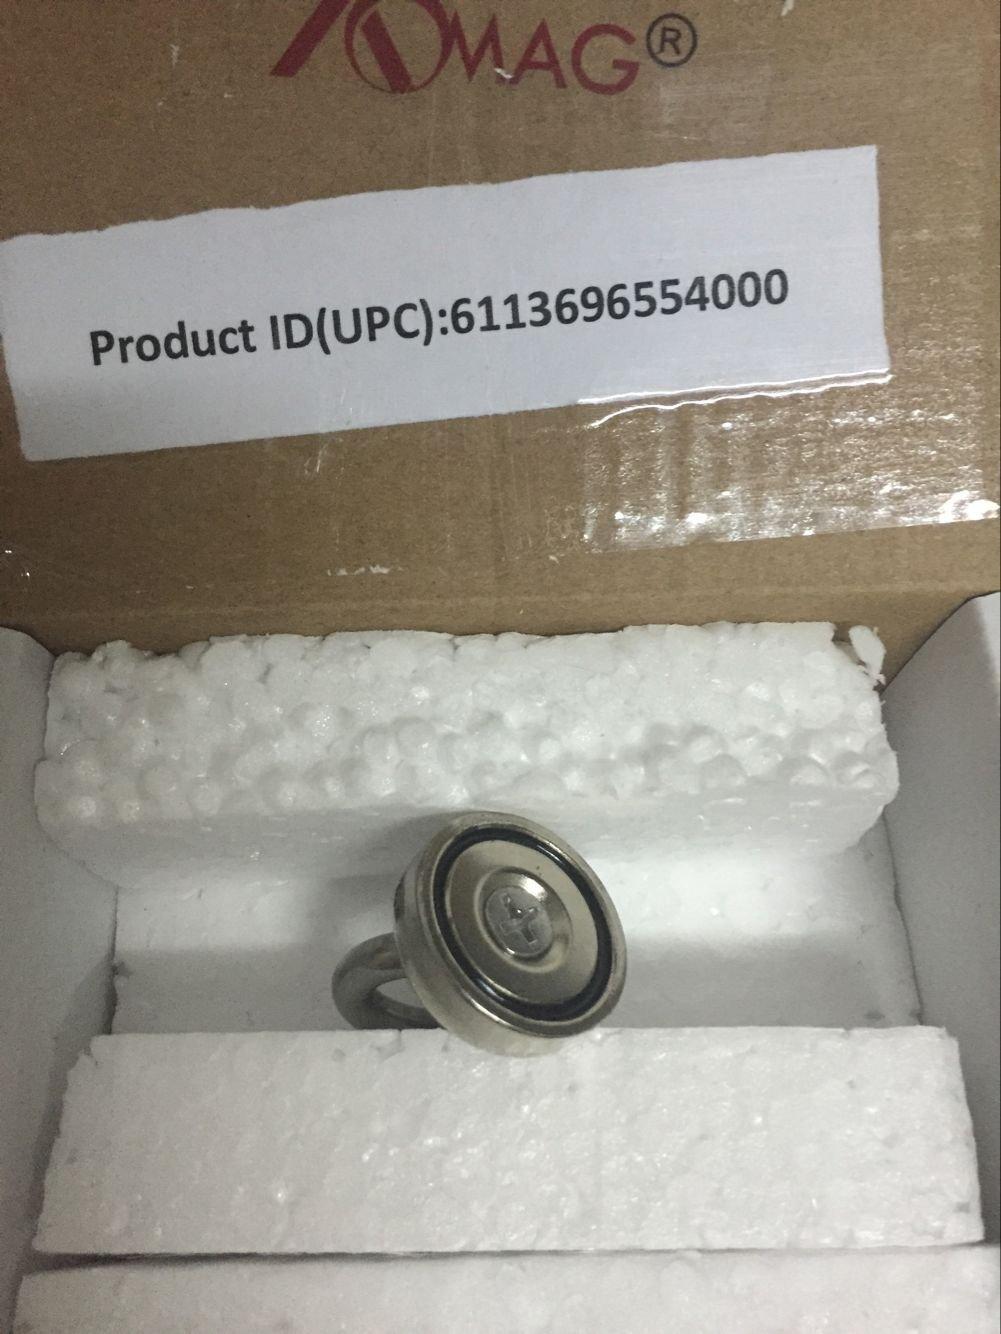 AOMAG Strong N52 Neodymium Eyebolt Circular Rings Magnet 25x30mm For 14KG Salvage